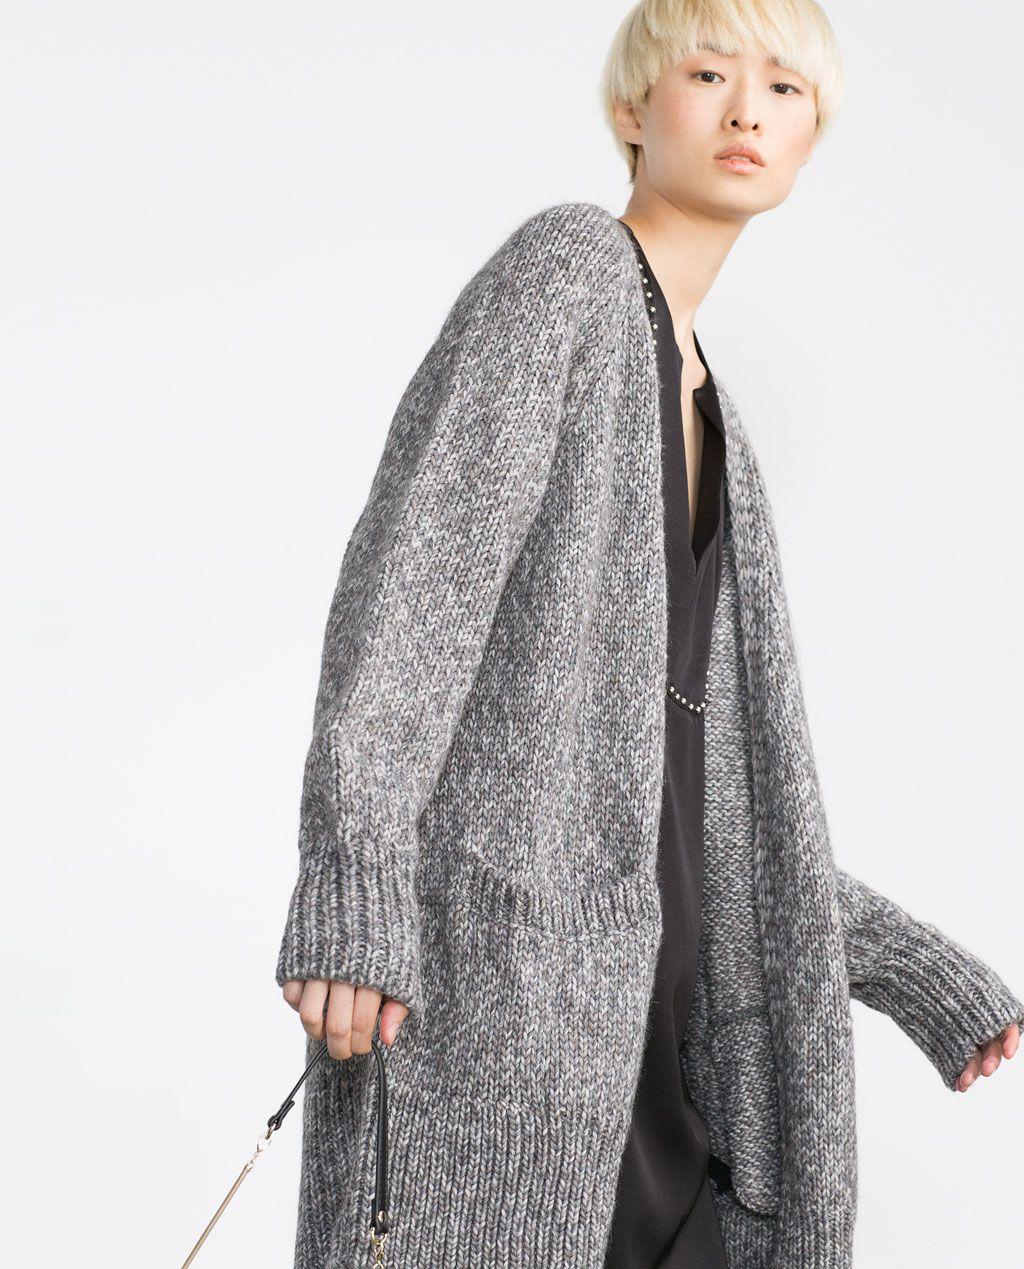 matériau sélectionné chaussure meilleure vente OVERSIZED CARDIGAN-Cardigans-Knitwear-WOMAN | ZARA United ...